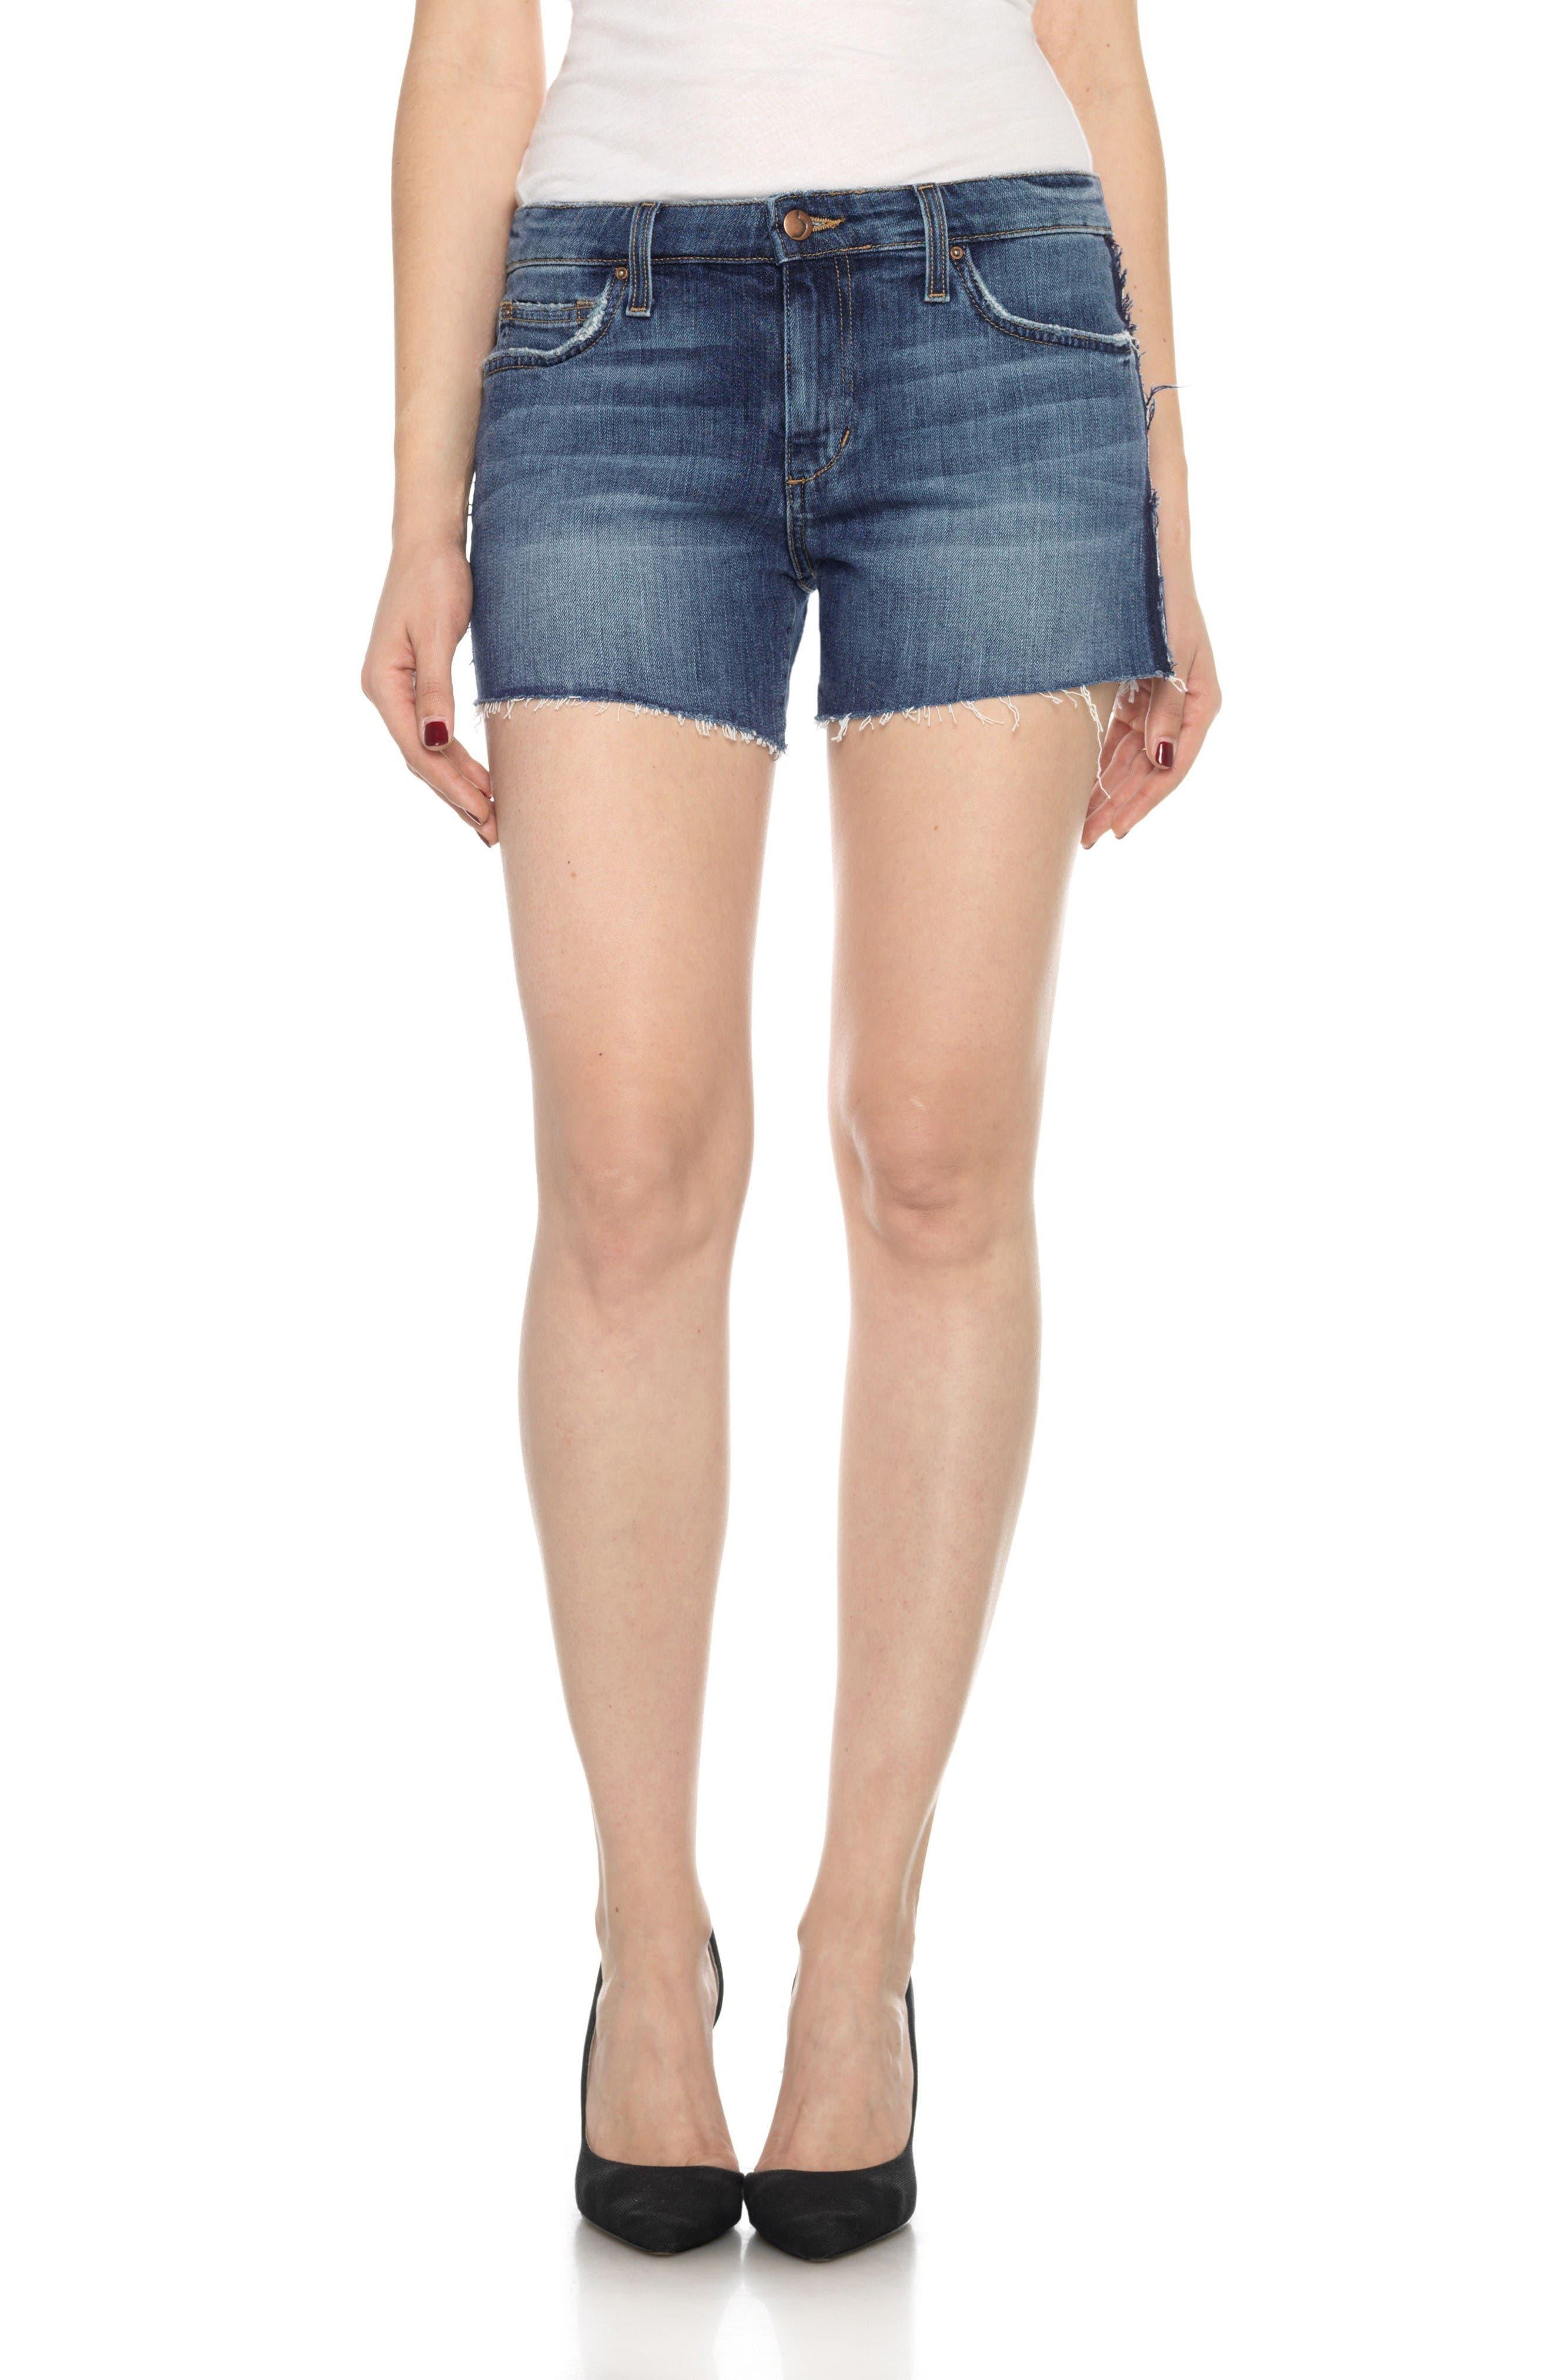 JOES Collectors - Ozzie Cutoff Denim Shorts